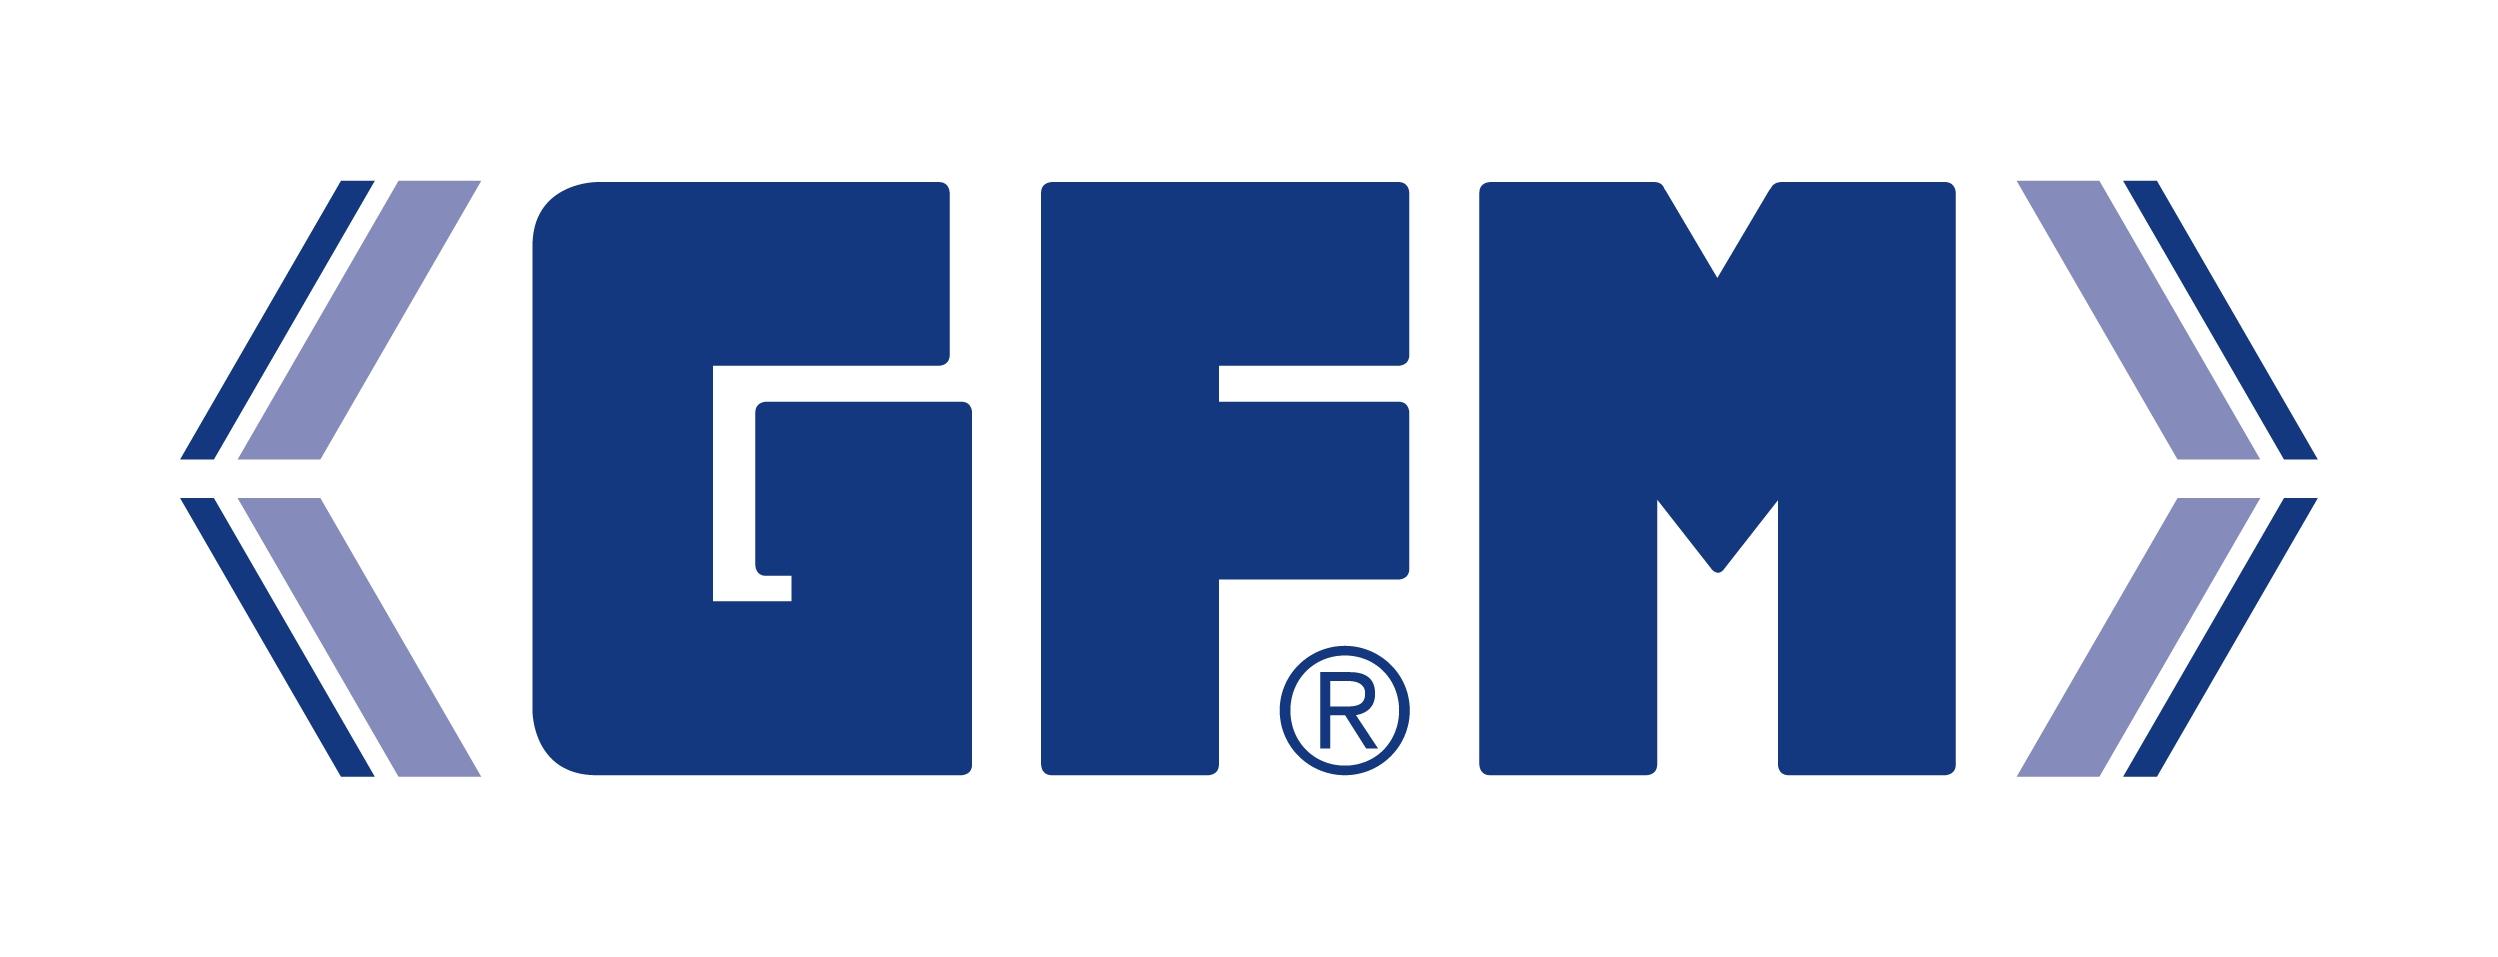 GFM_Global_mitSchutzzone